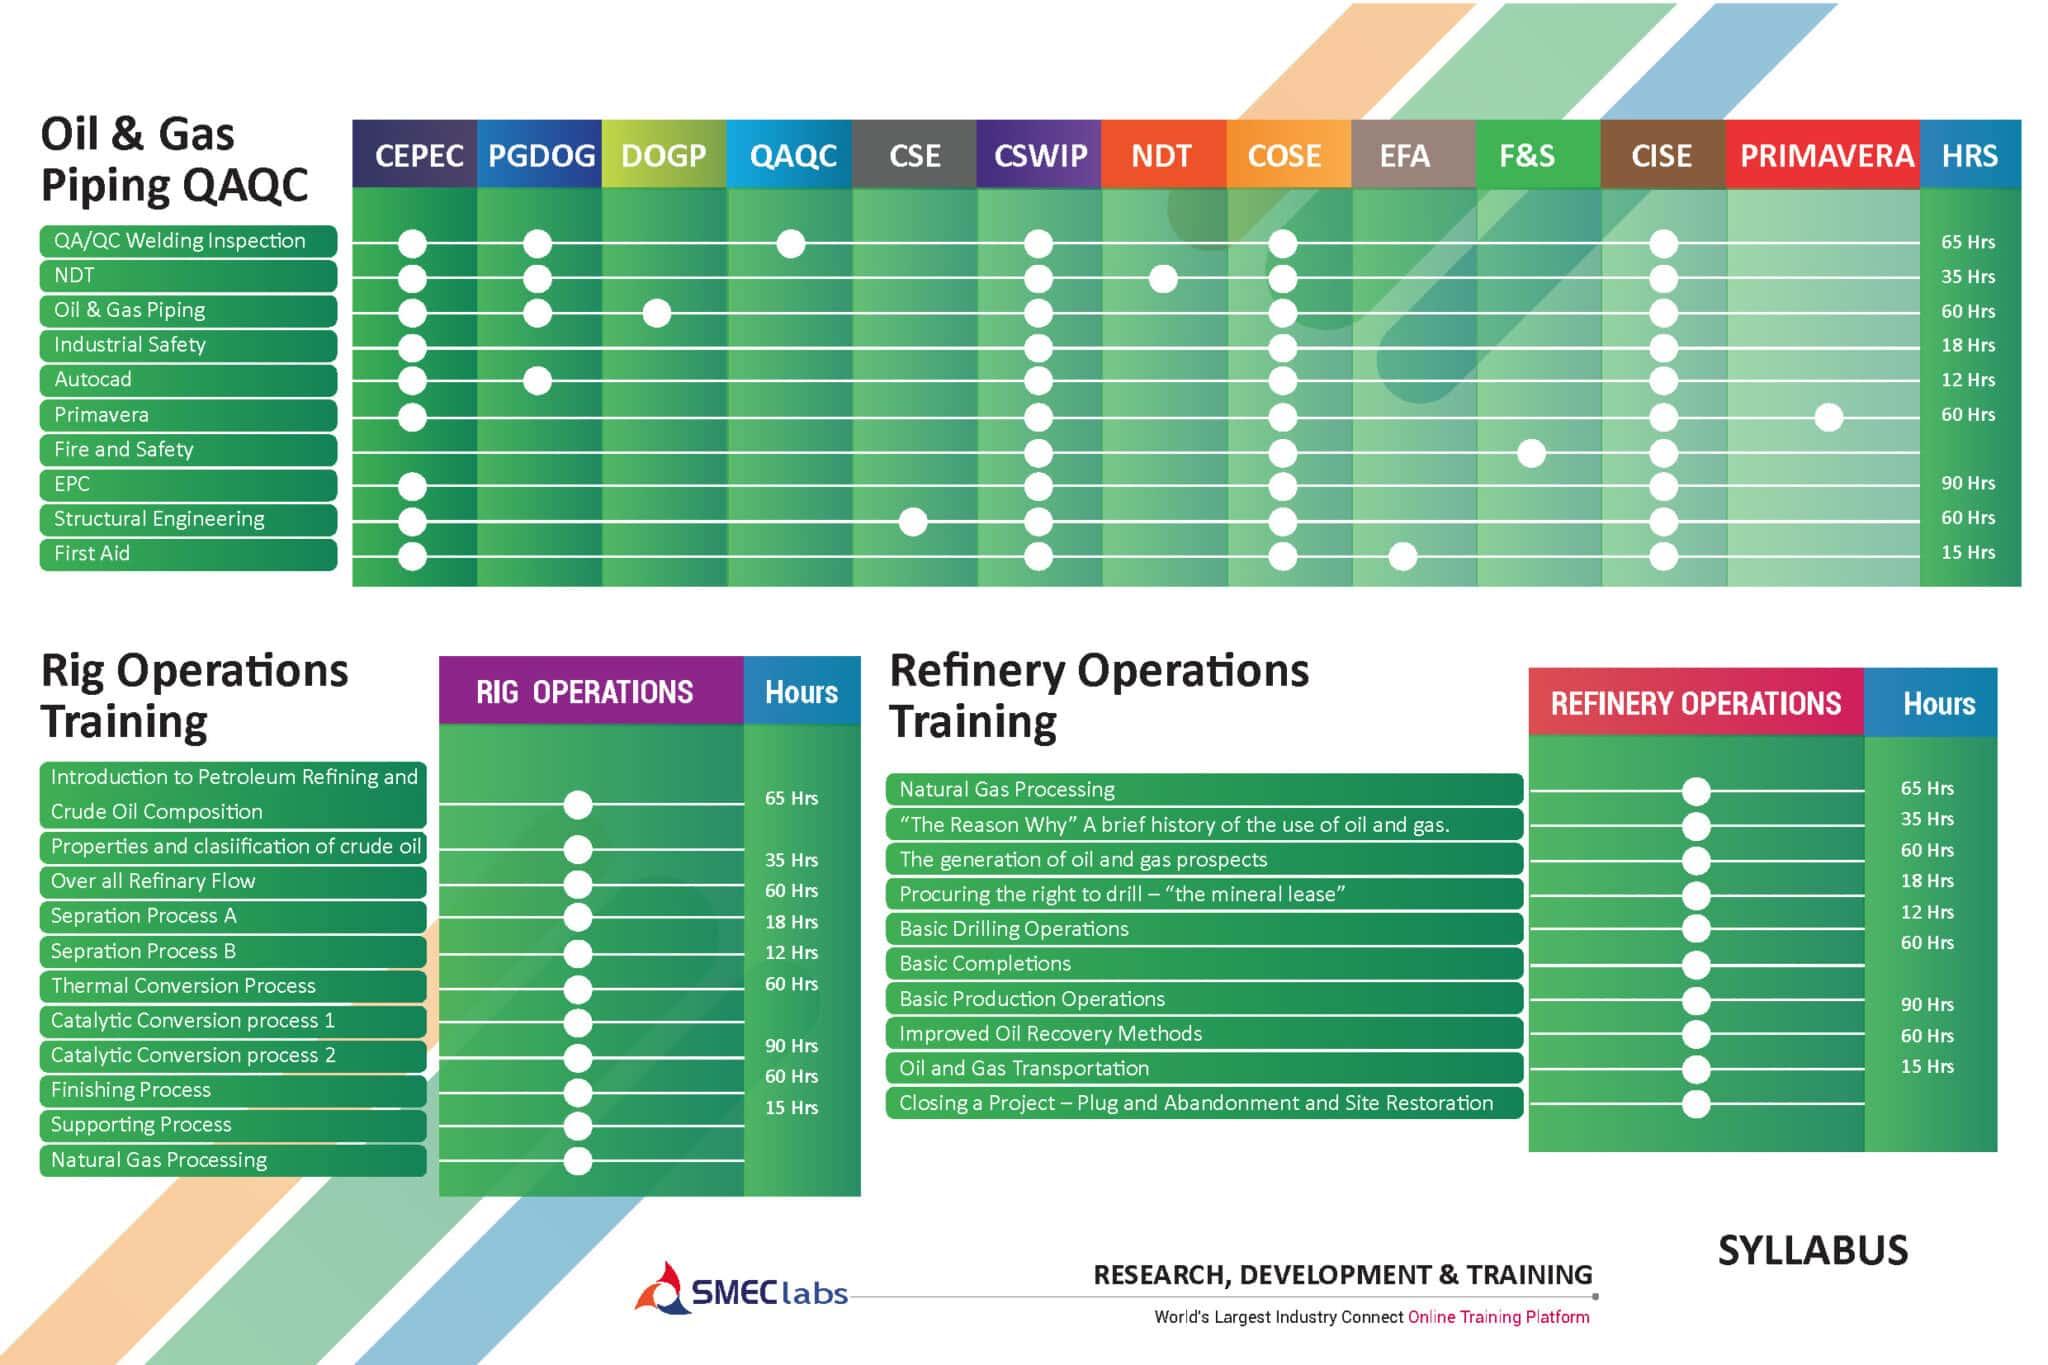 Oil & Gas Piping QA QC NDT Training Brochure Pdf